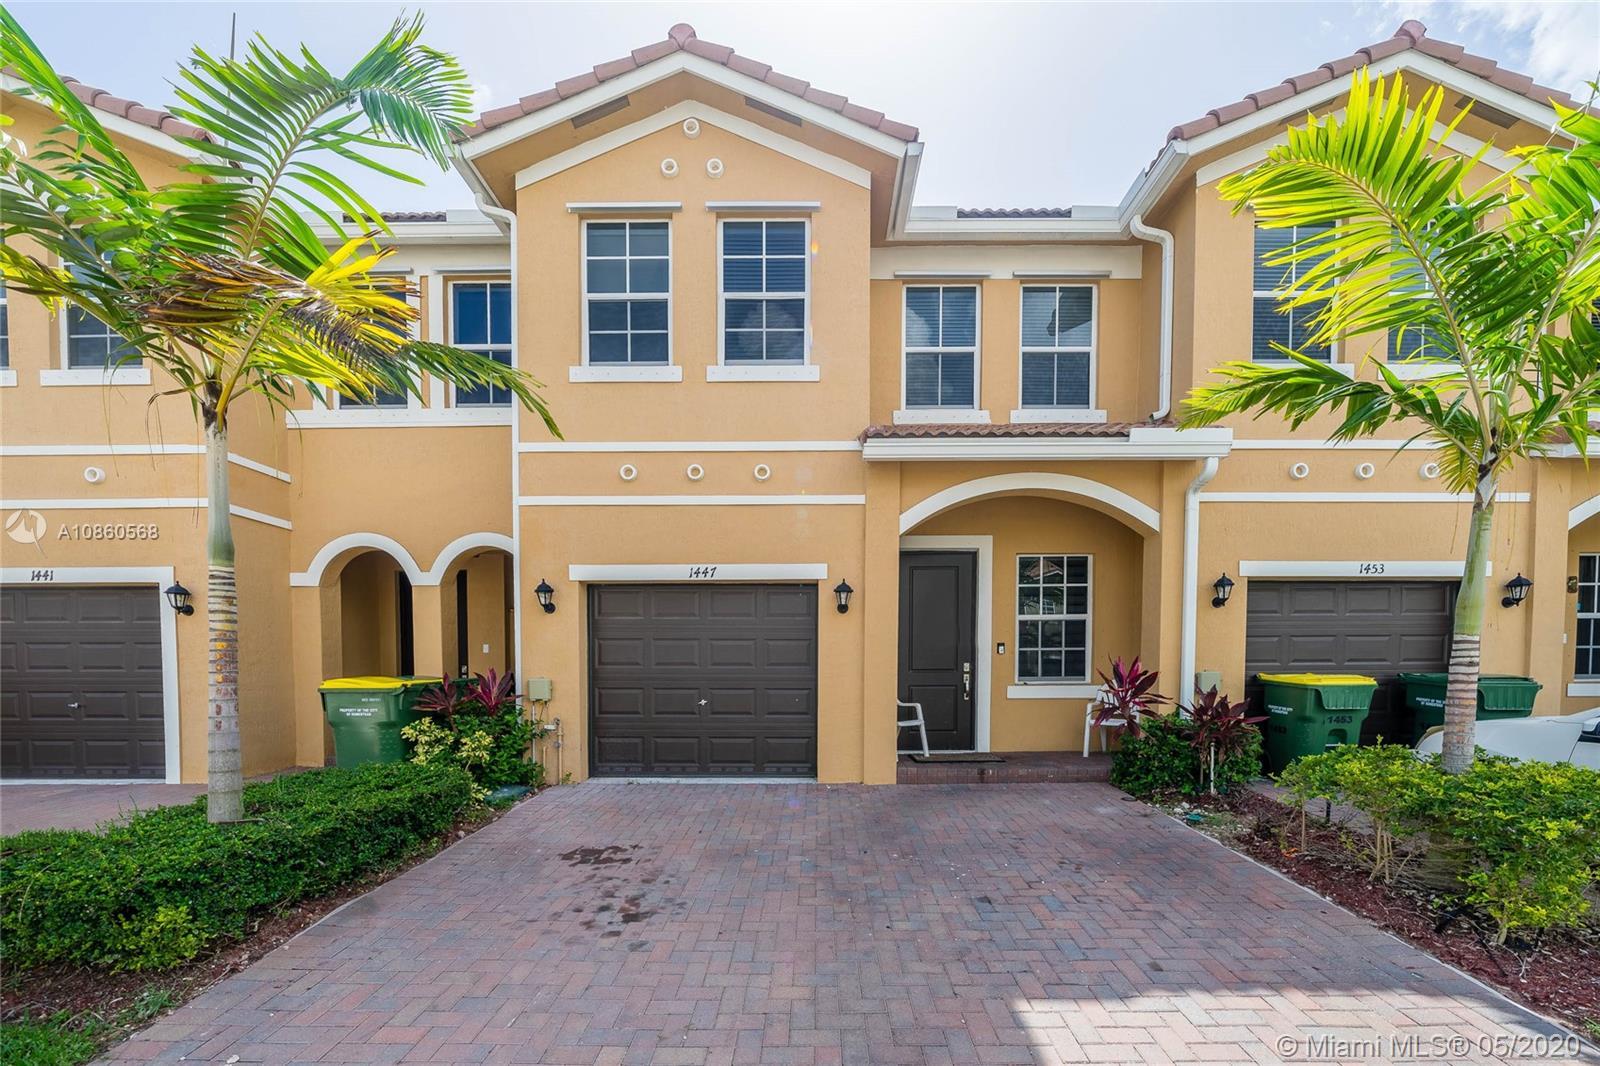 1447 SE 24th Ave #0, Homestead, FL 33035 - Homestead, FL real estate listing